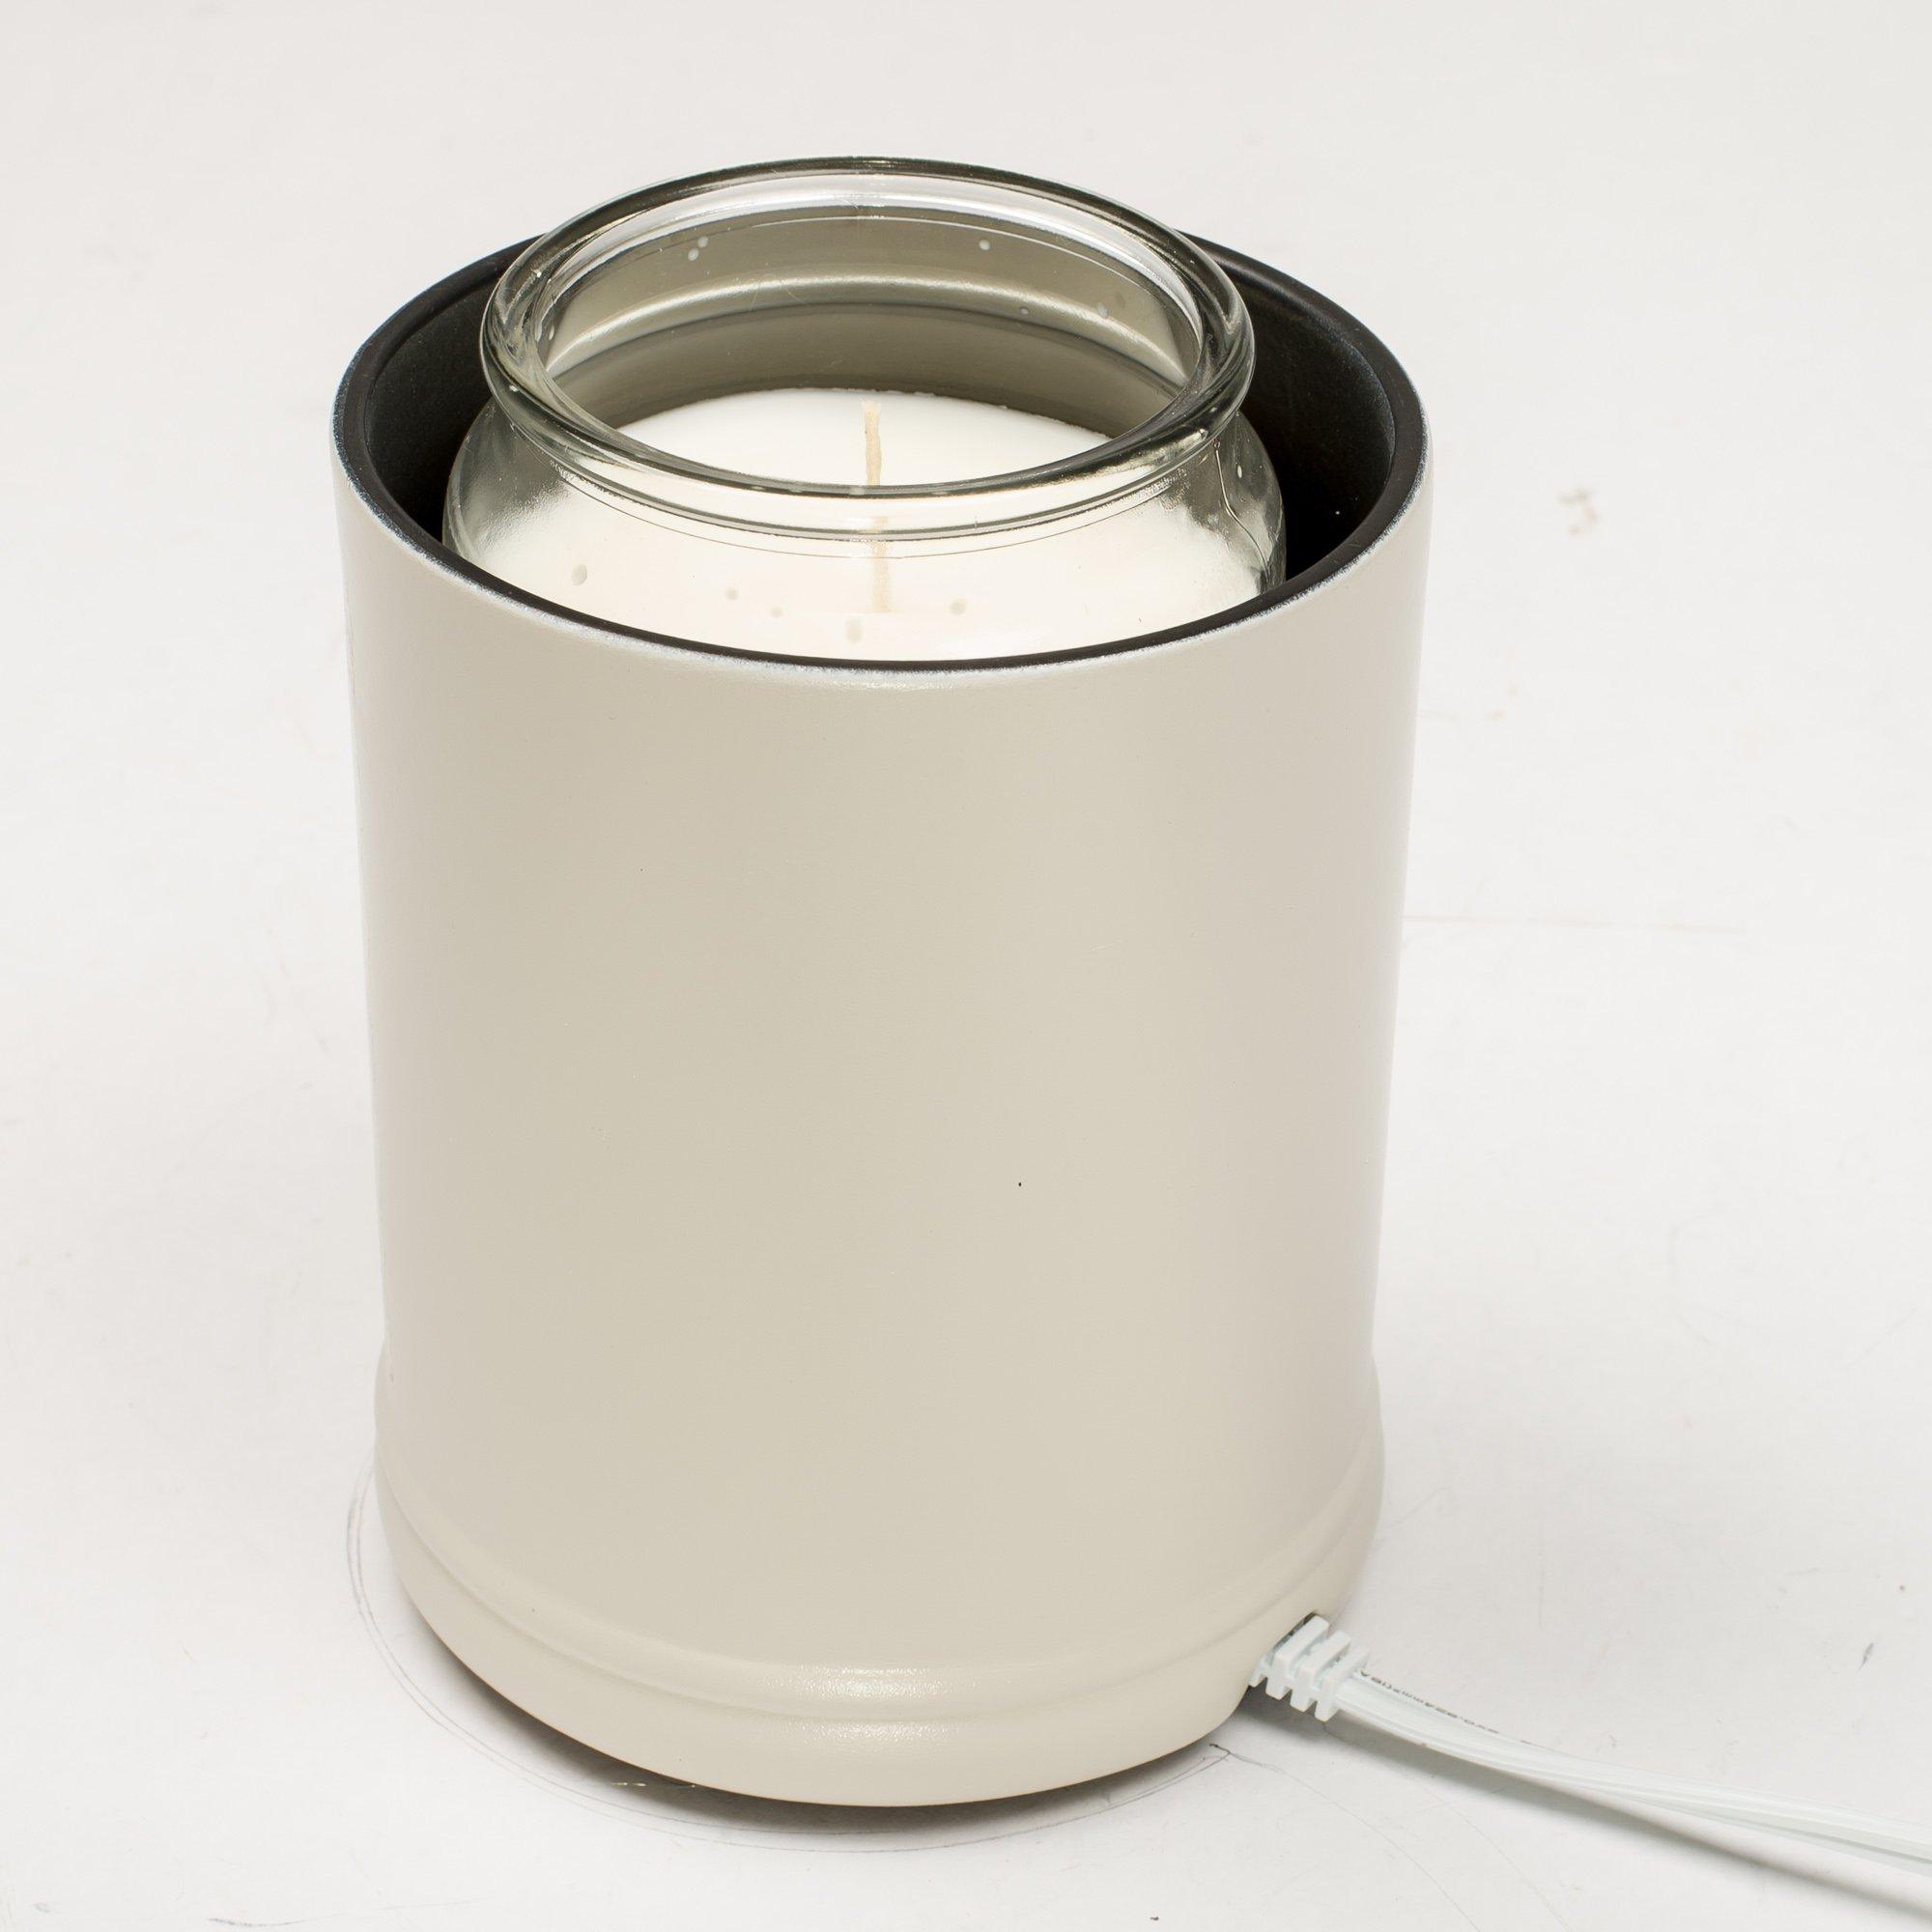 Elanze Designs You are Braver Stronger Smarter Ceramic Stoneware Electric Jar Candle Warmer by Elanze Designs (Image #4)